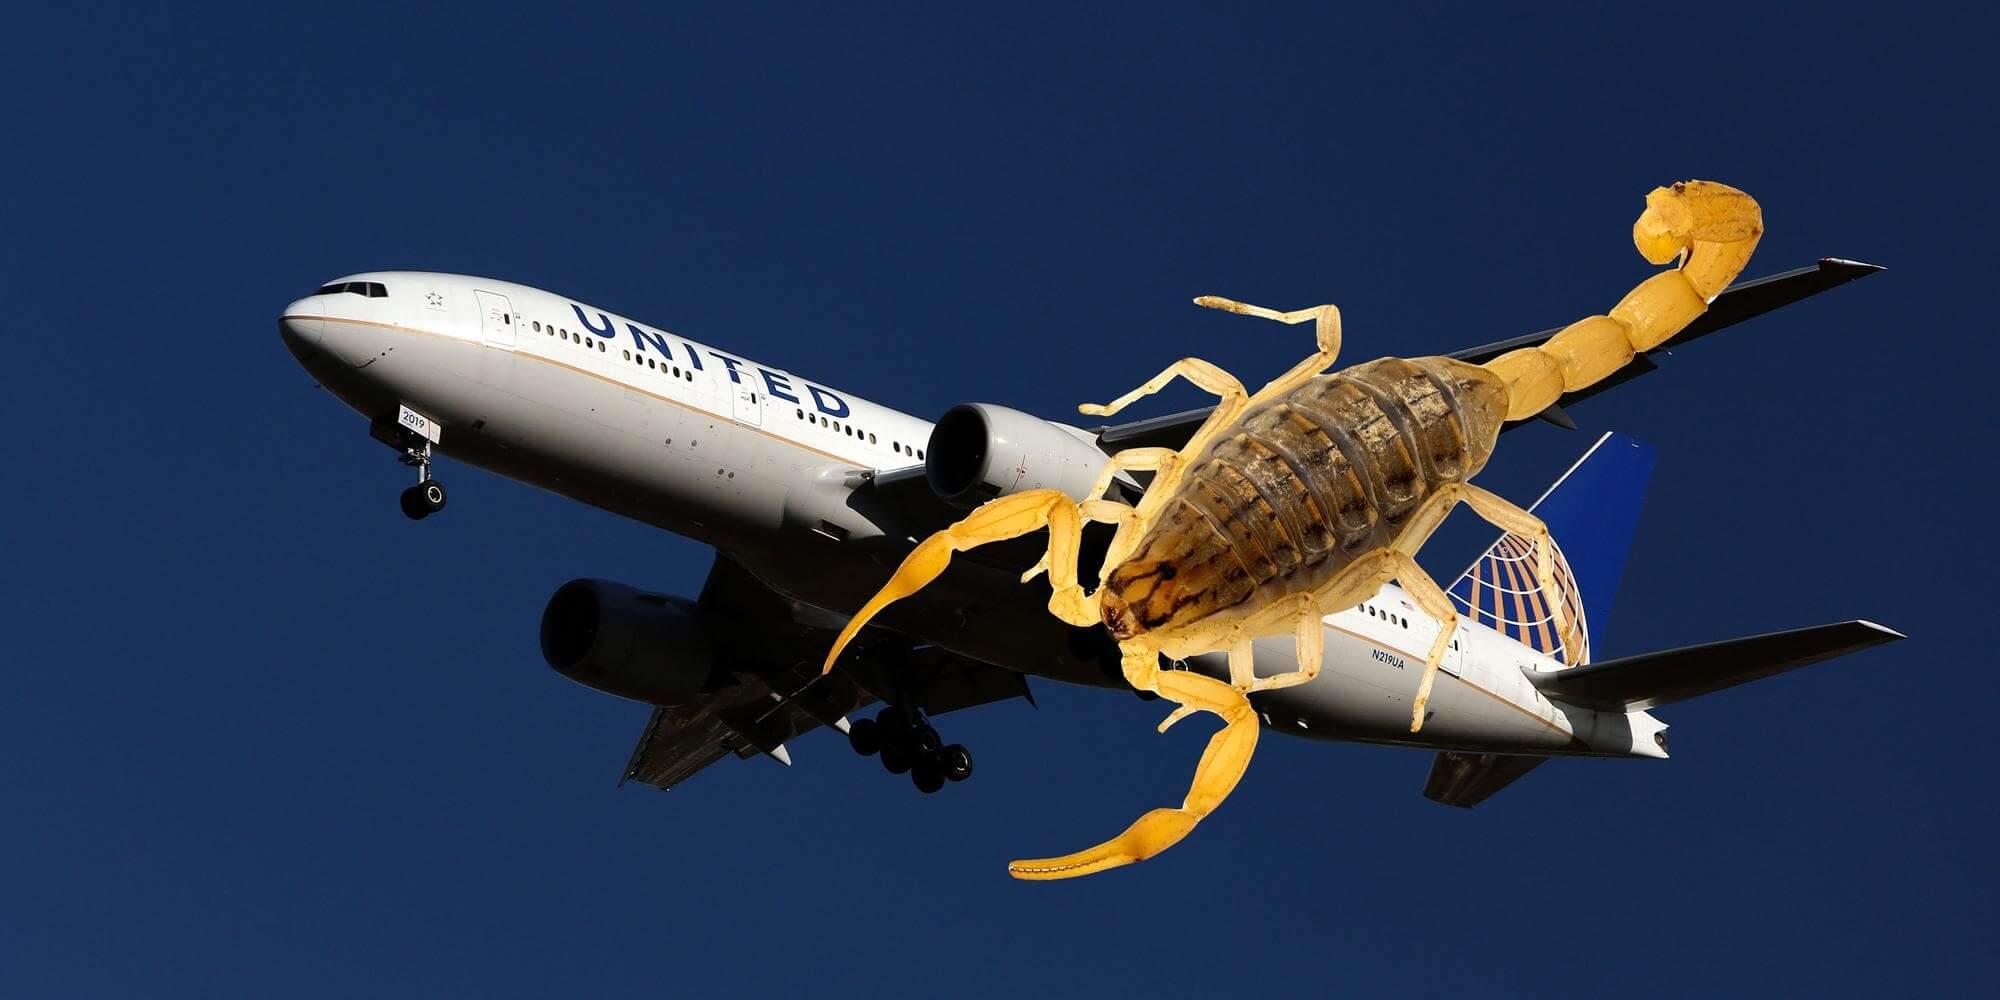 Scorpion attacks United Airlines passenger on San Francisco-Atlanta flight